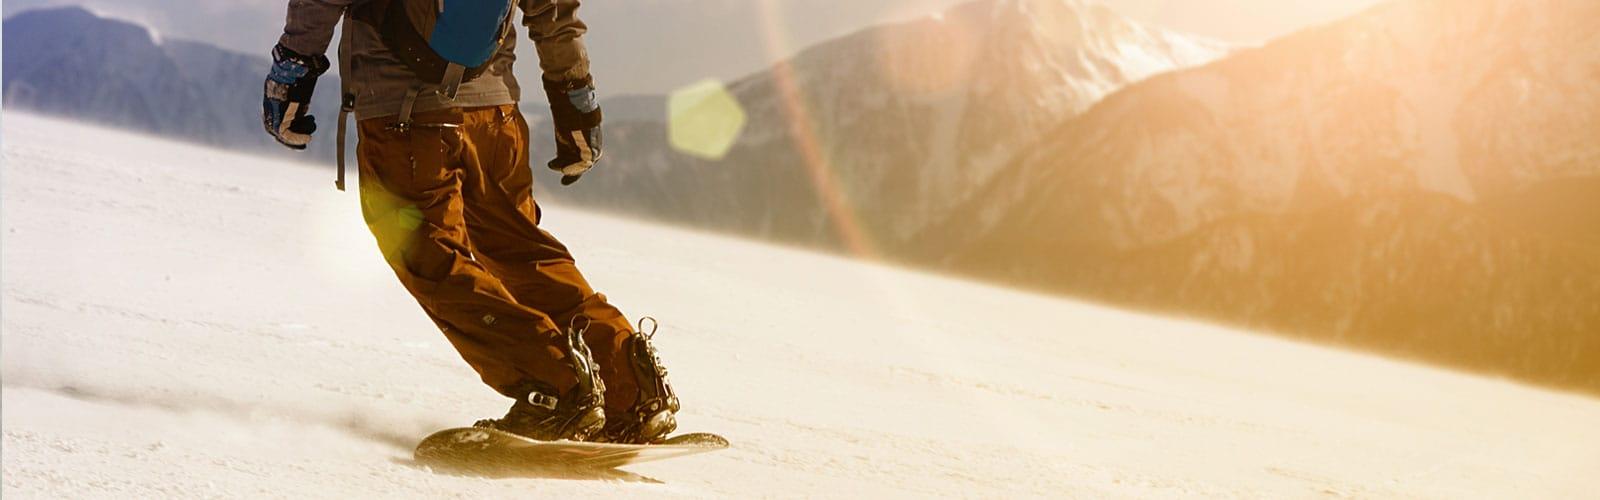 Snowboard Boot Flex